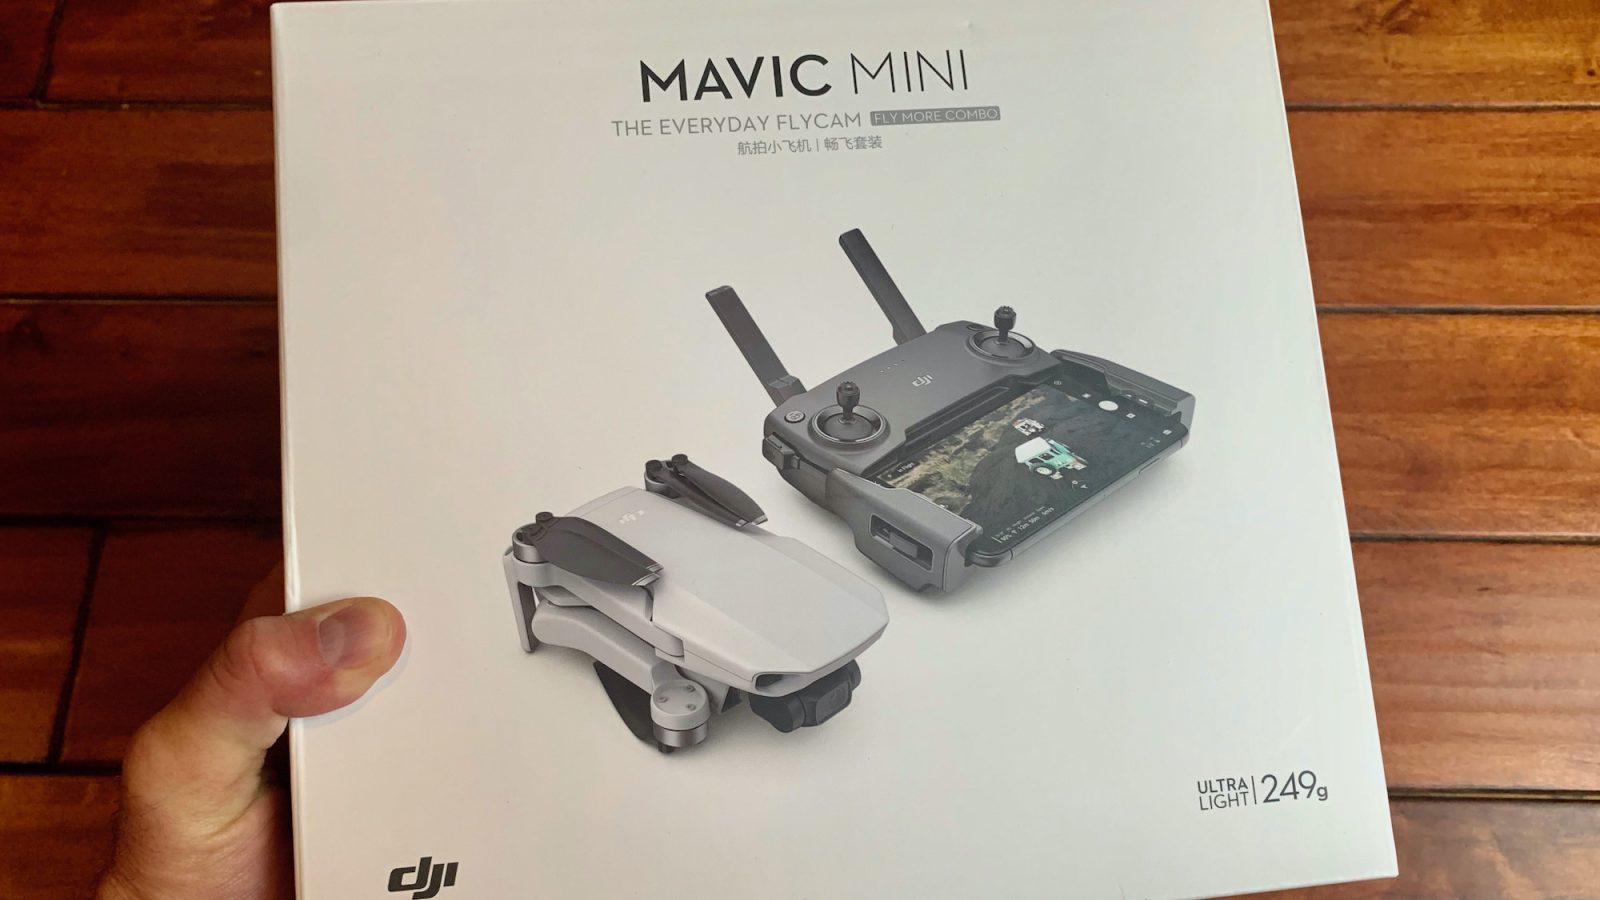 Dronedj S Dji Mavic Mini Giveaway Winners Announced On March 15th